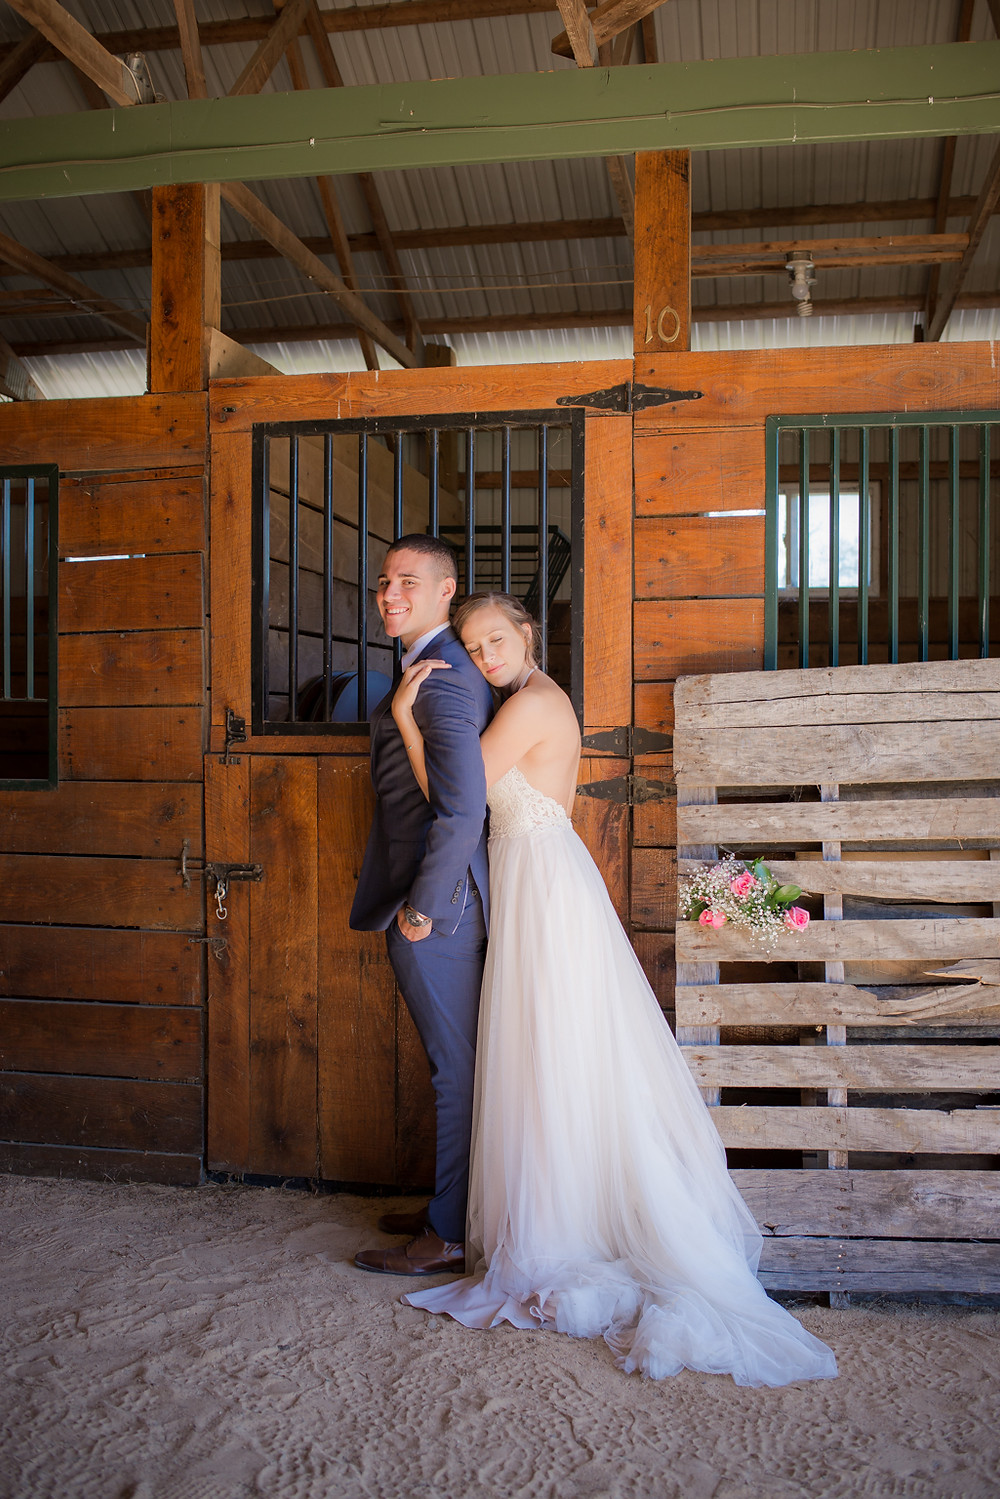 Northern Virginia Venue - The Barns at Maple Valley Farm LLC